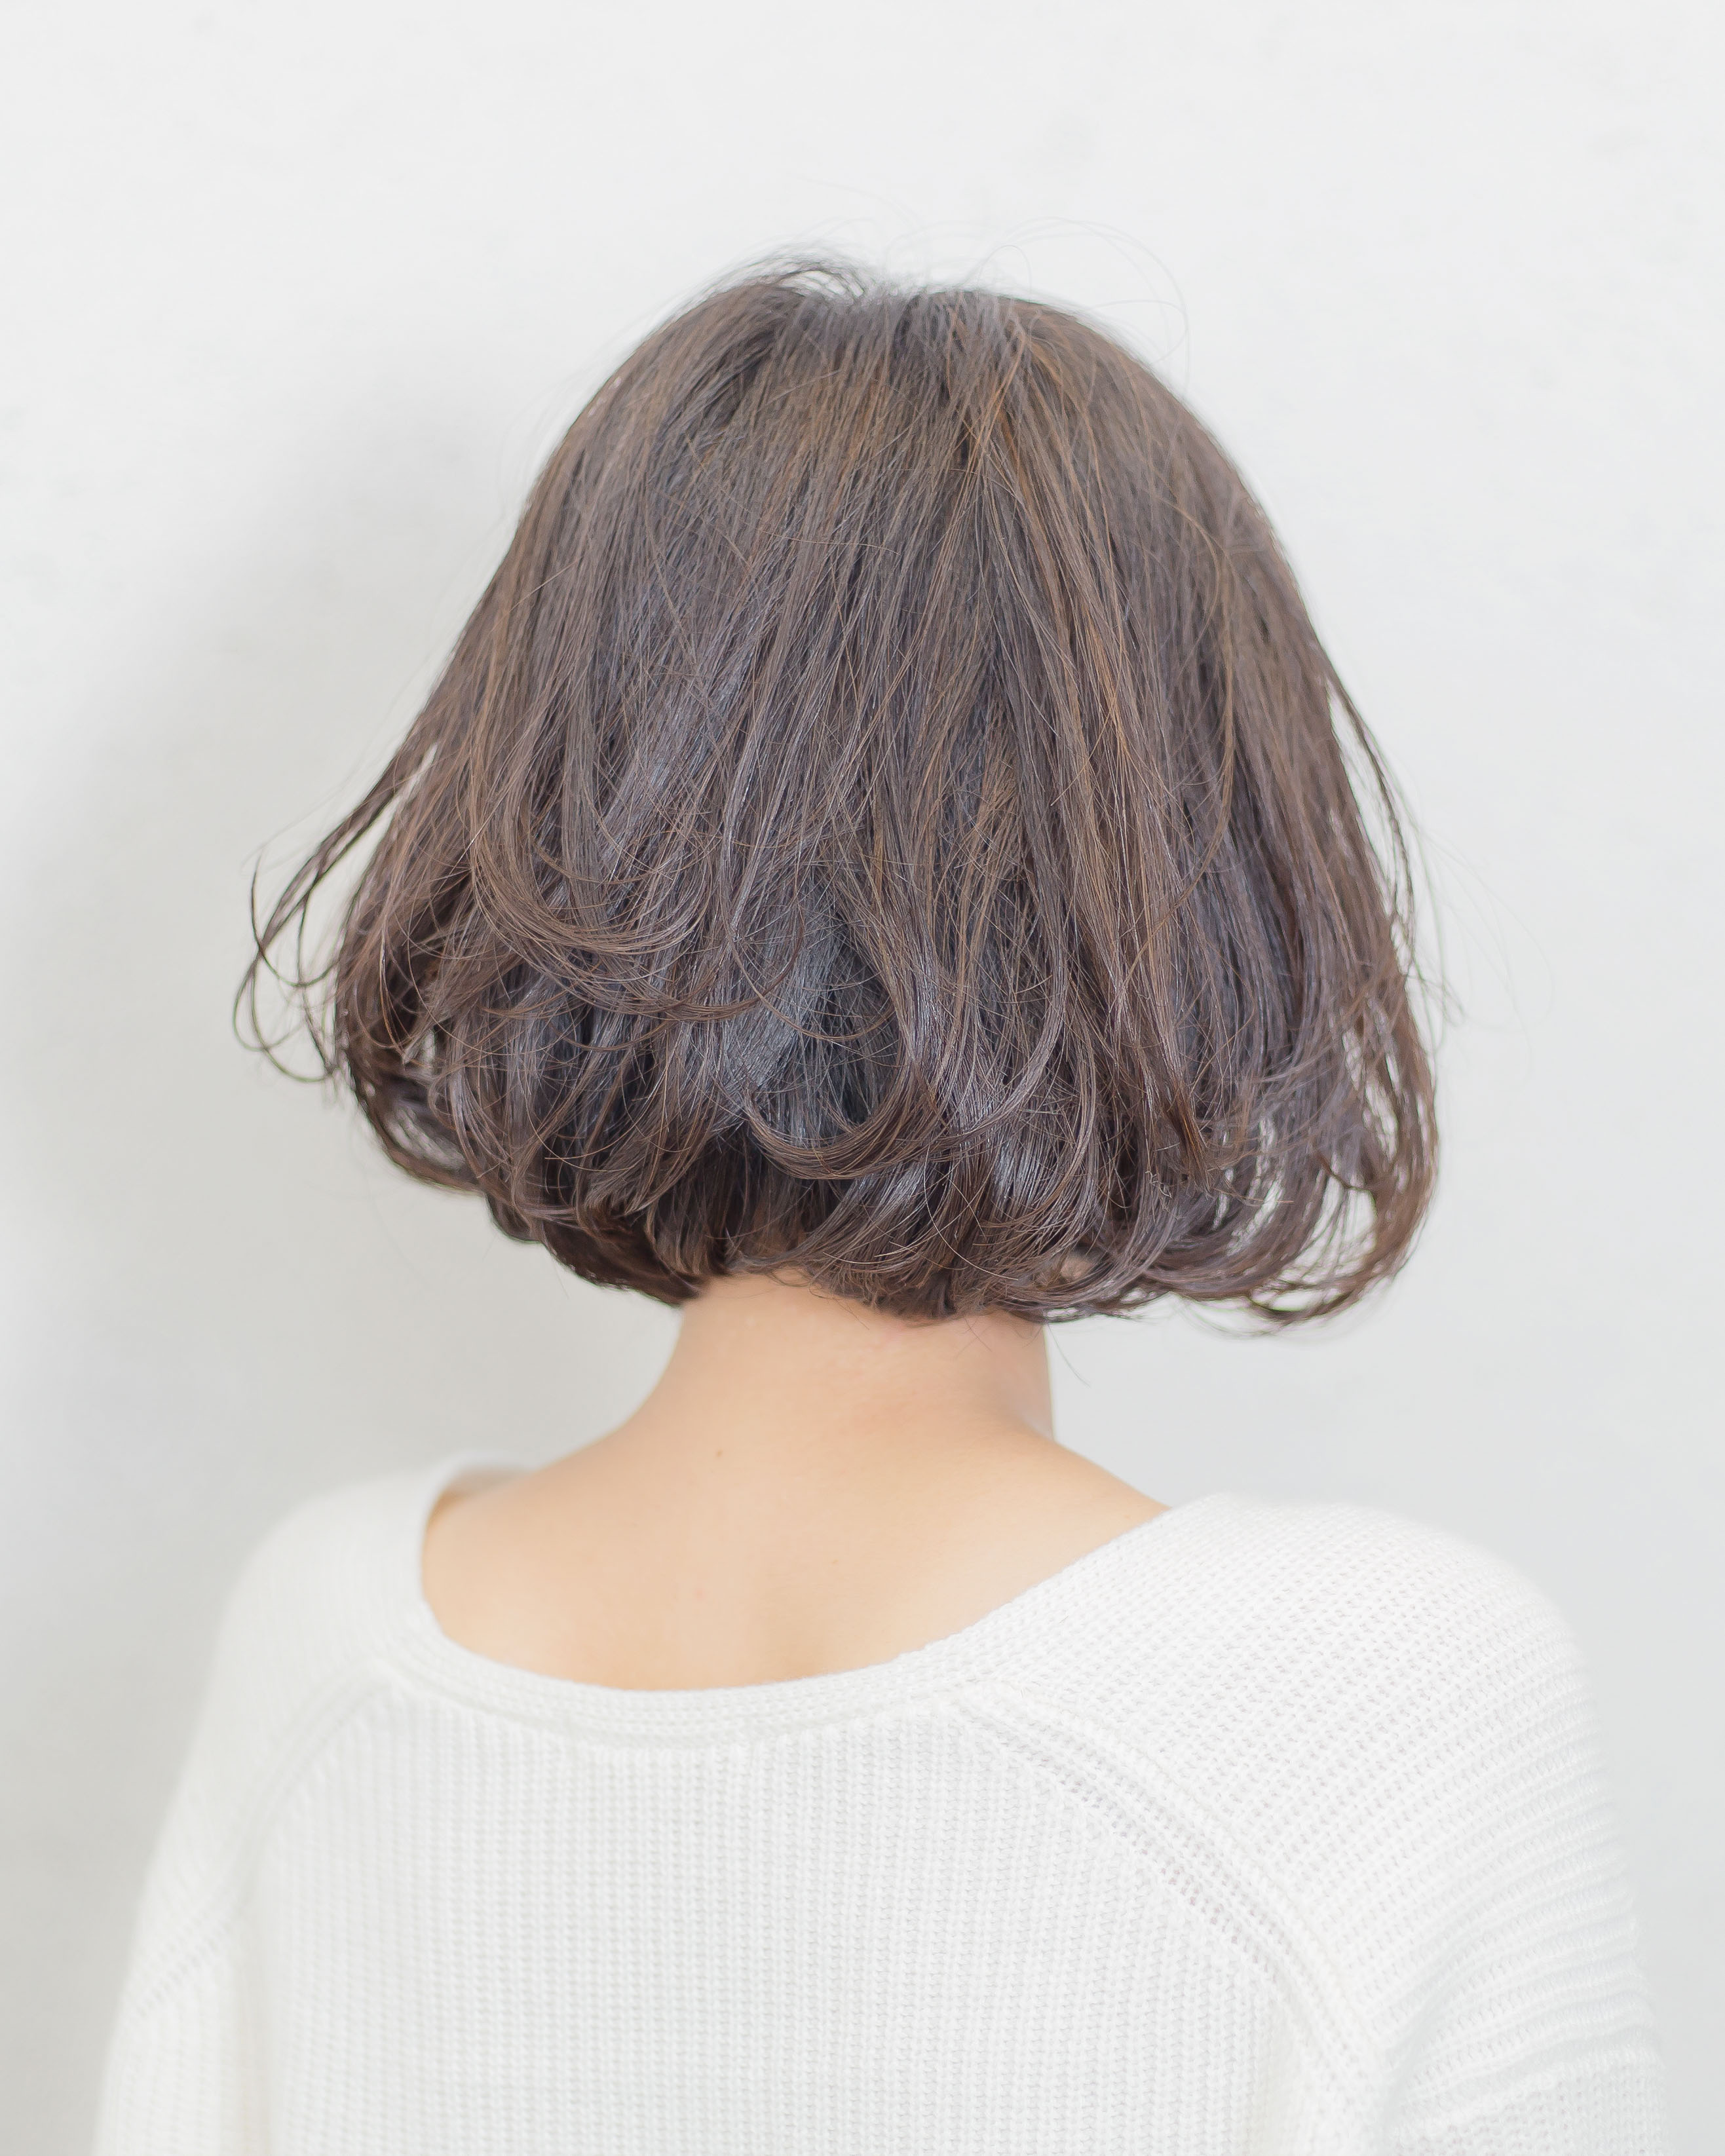 髪型 latte